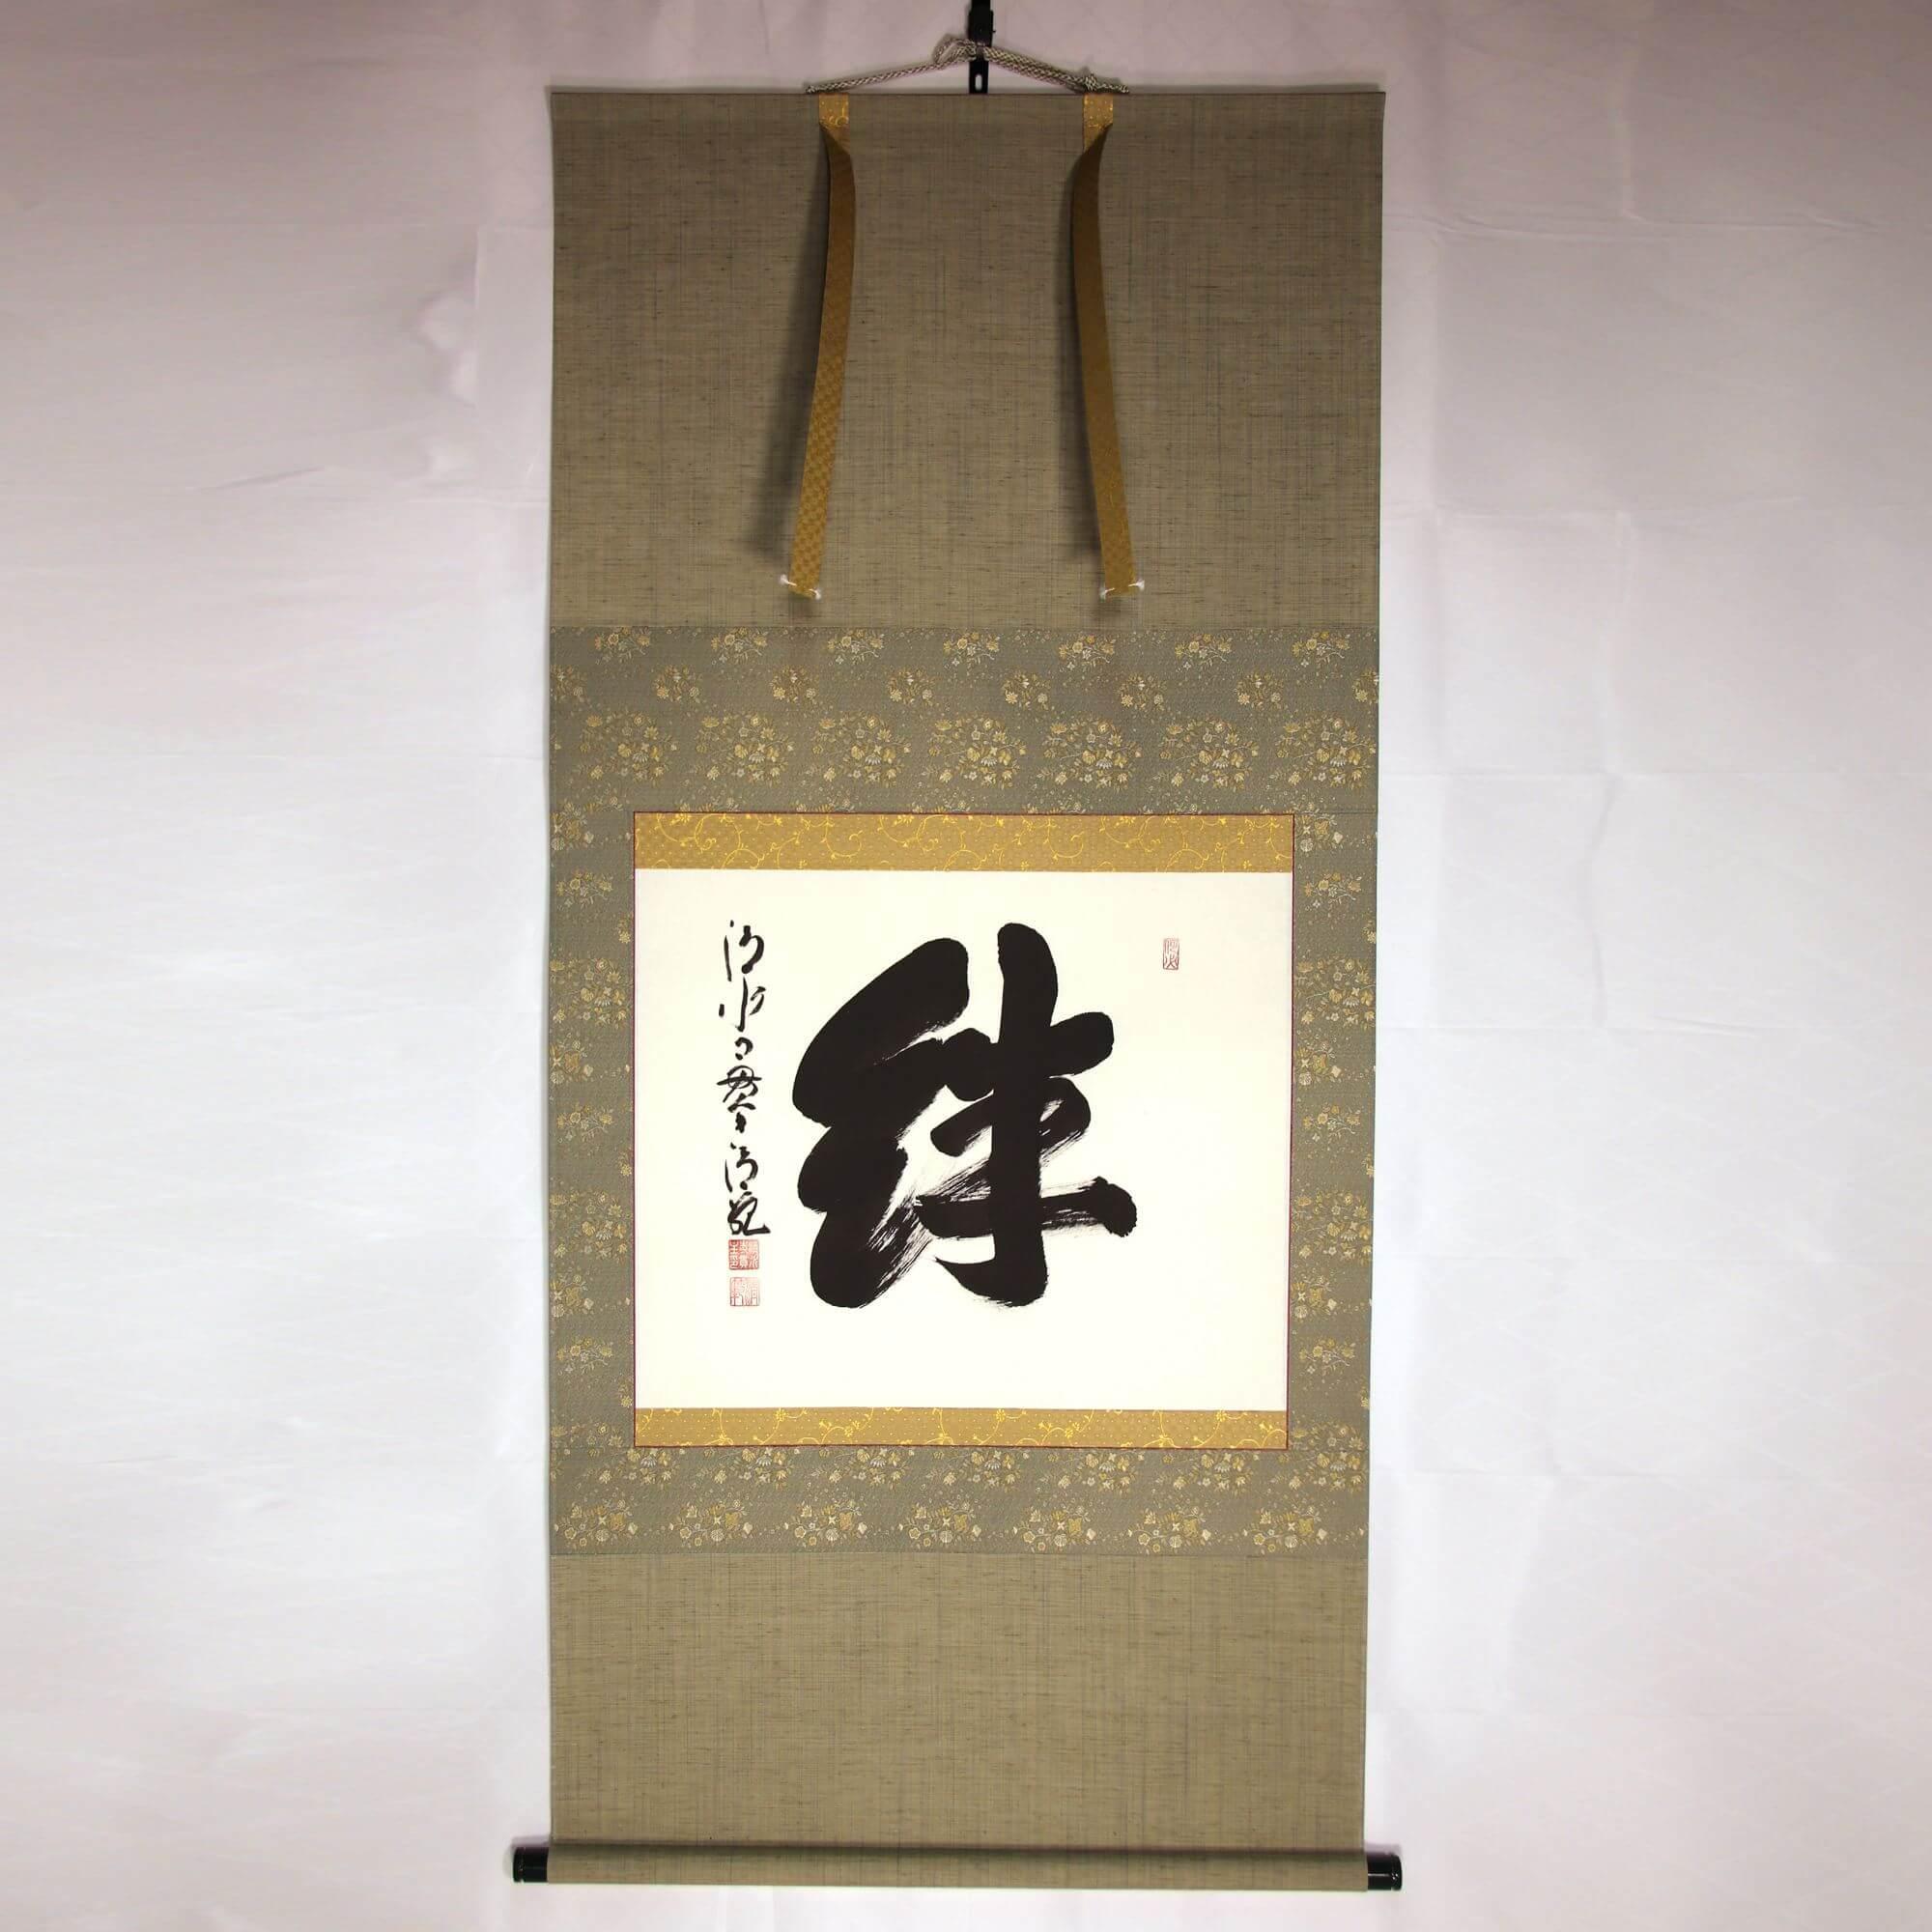 Calligraphy: Kizuna / Seihan Mori